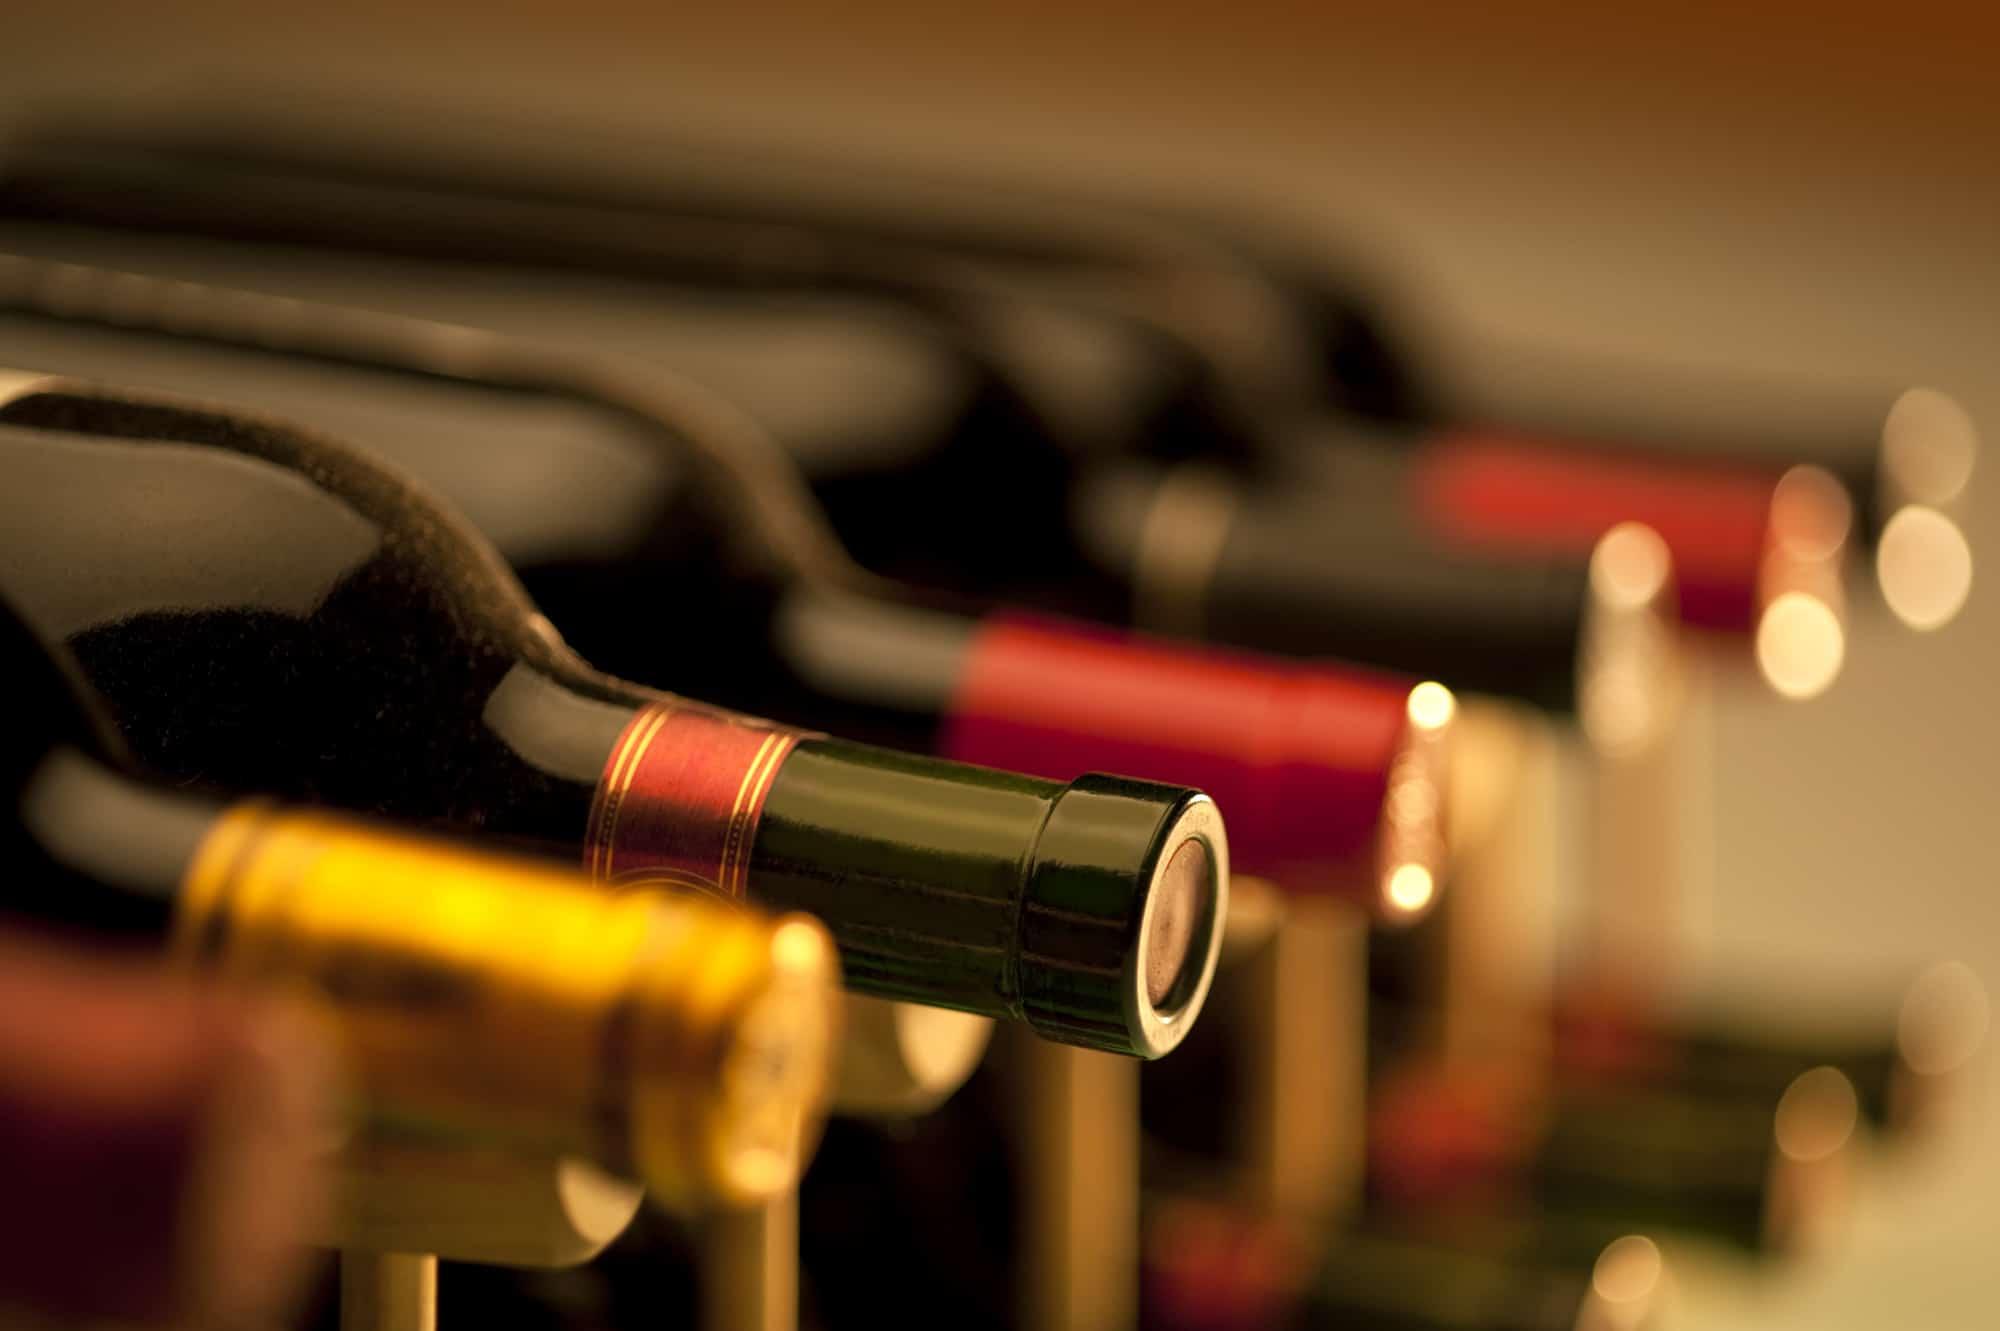 Several bottles of wine set on their side